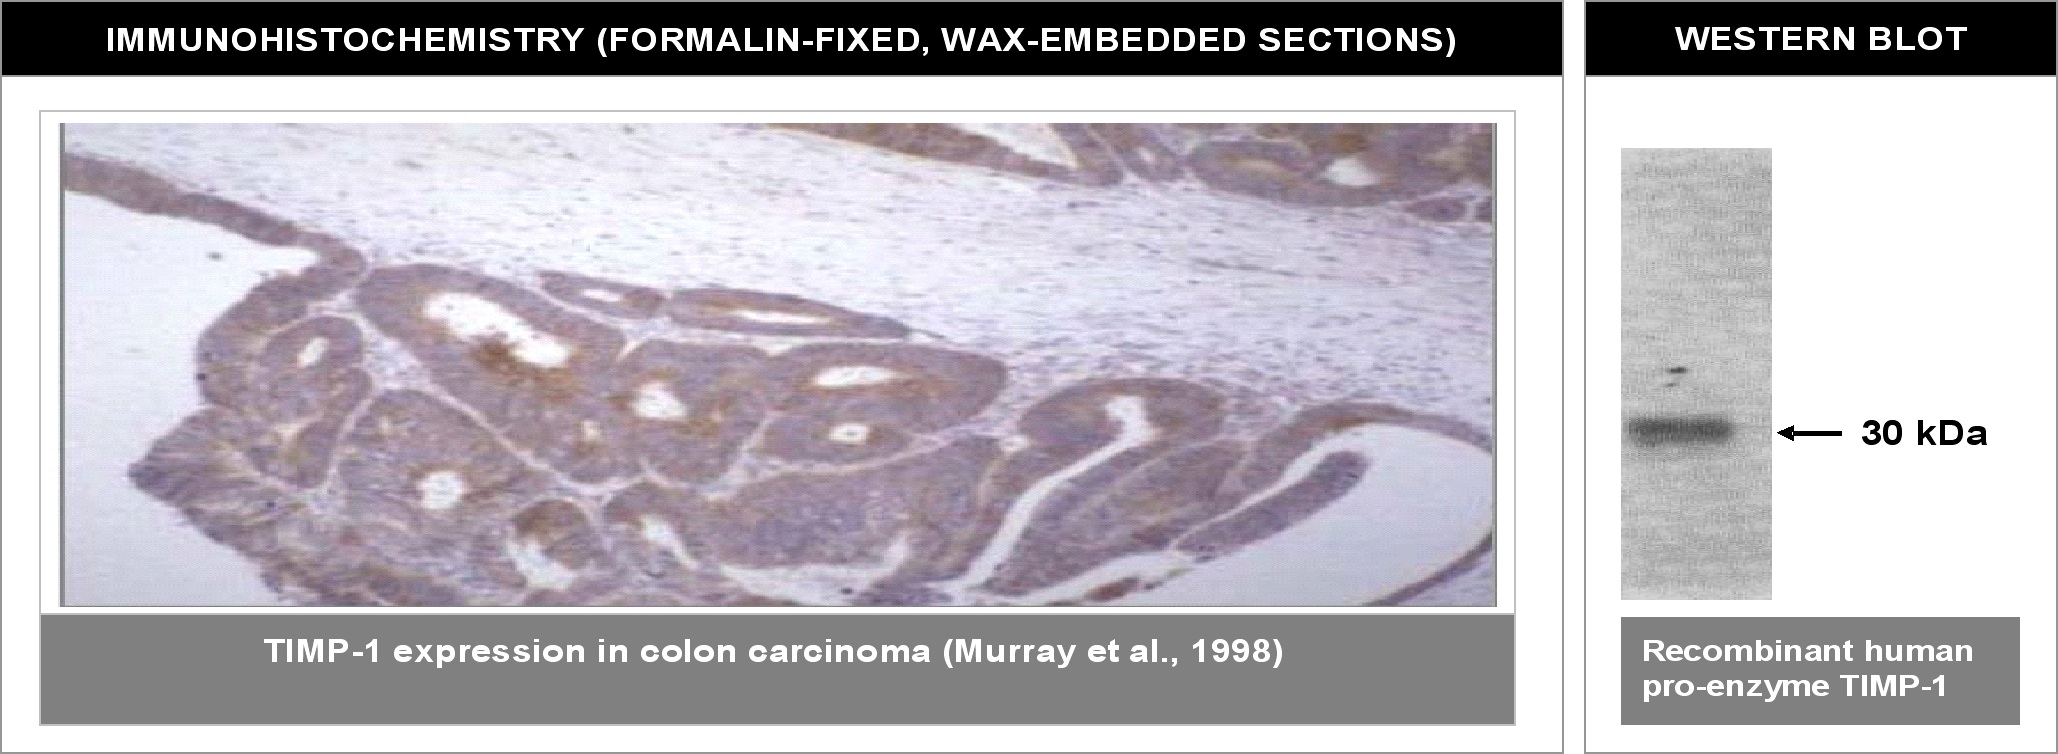 """ Left: Immunohistochemical staining of human colon carcinoma tissue using TIMP-1 antibody (Cat. No. X2058M). Right: Western blot using TIMP-1 antibody against recombinant human TIMP-1 proenzyme (400 ng/lane)."""